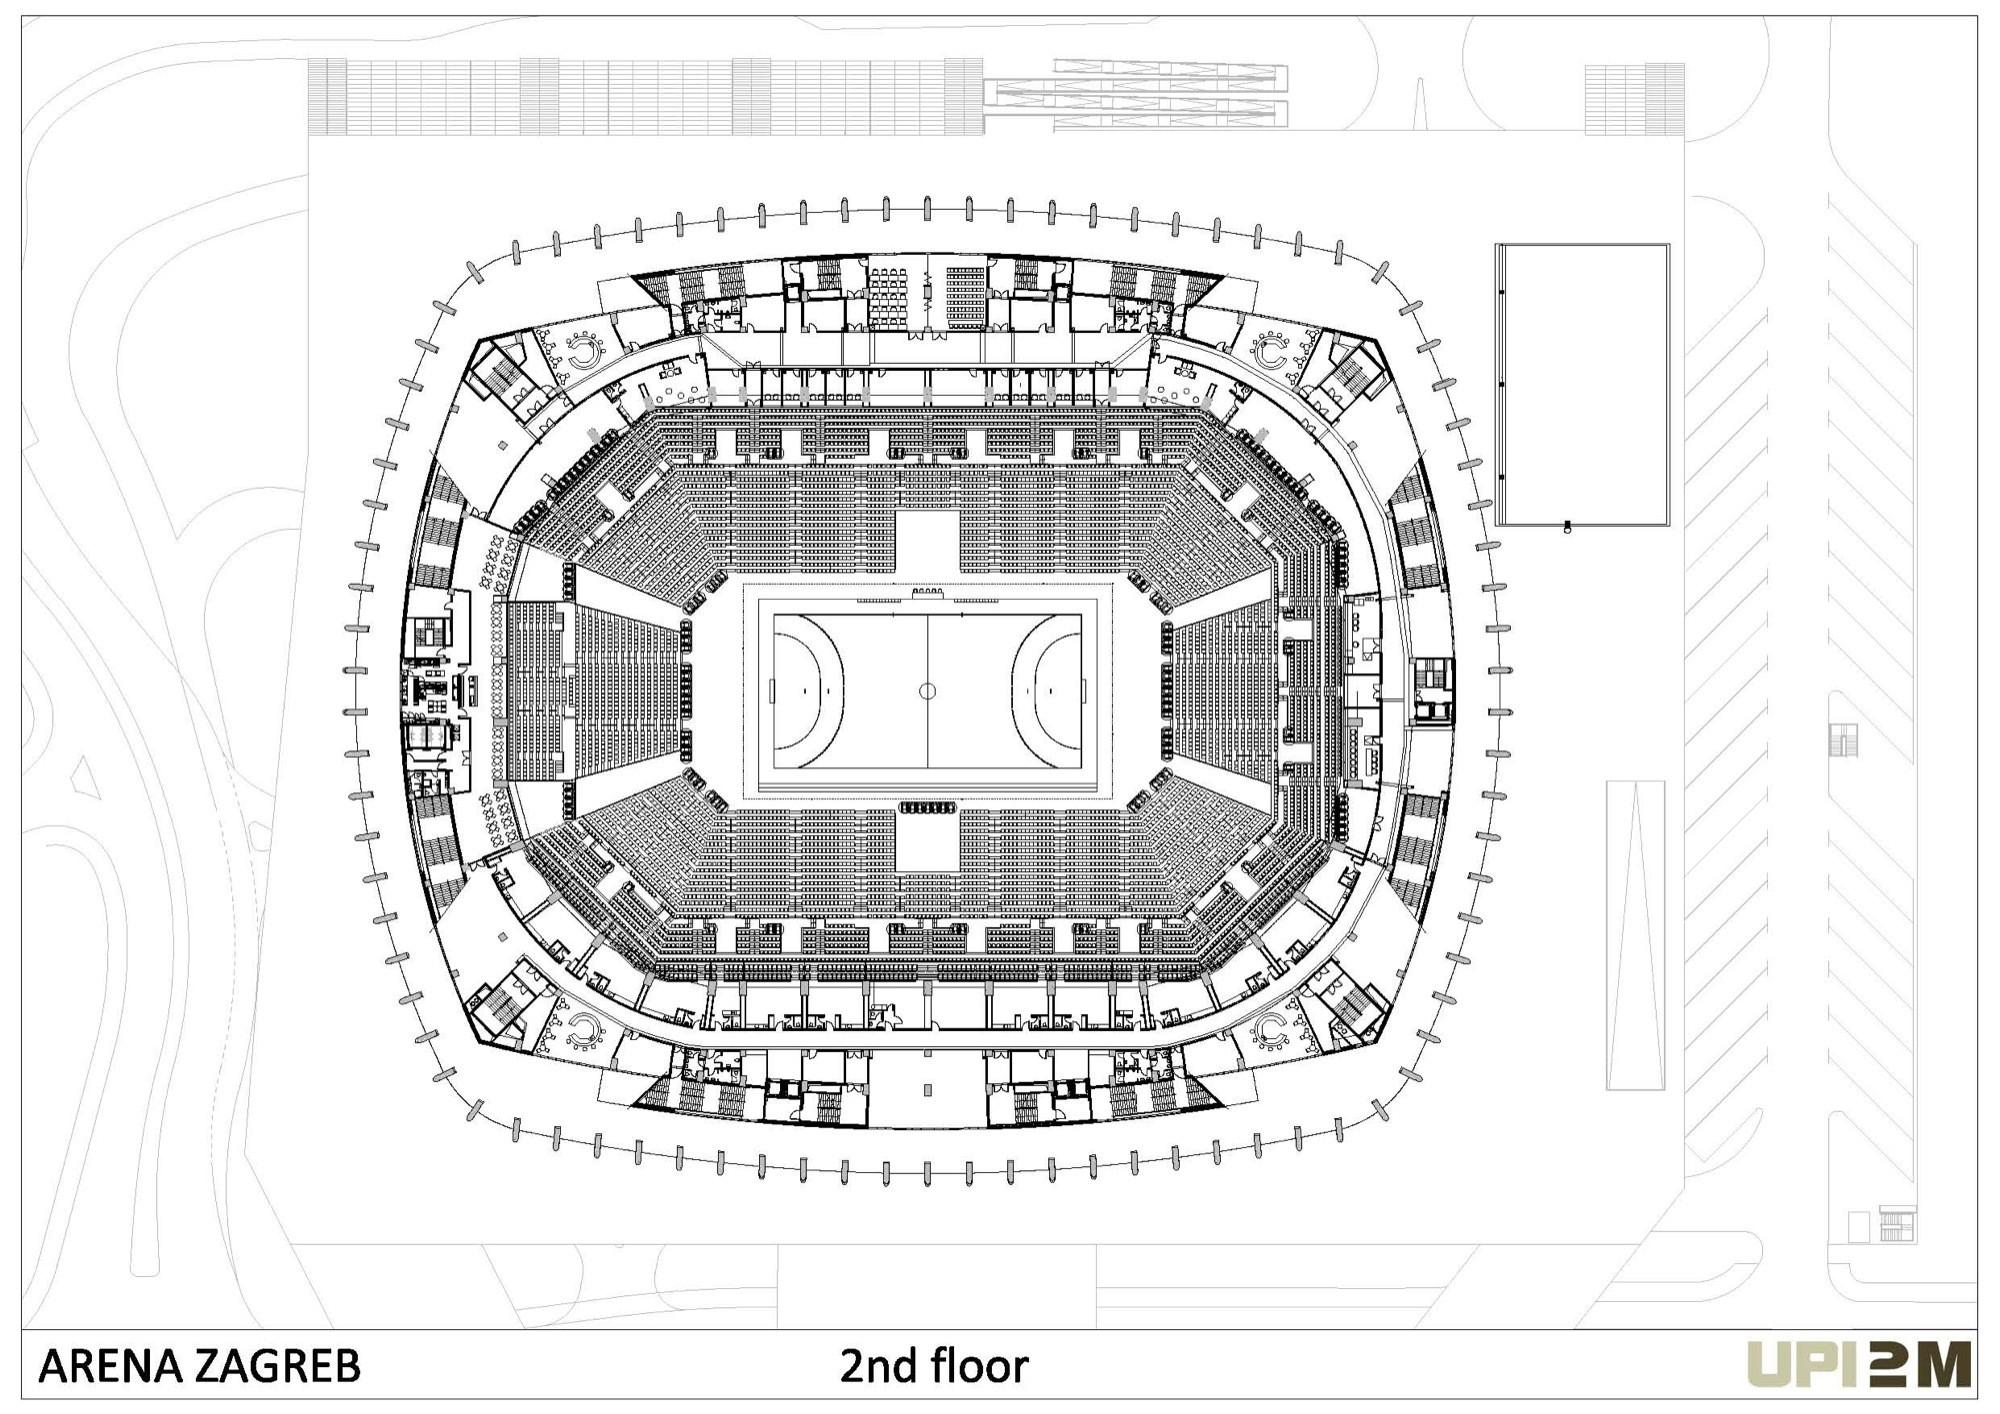 Basketball Arena Floor Plan Gallery Of Arena Zagreb Upi 2m 40